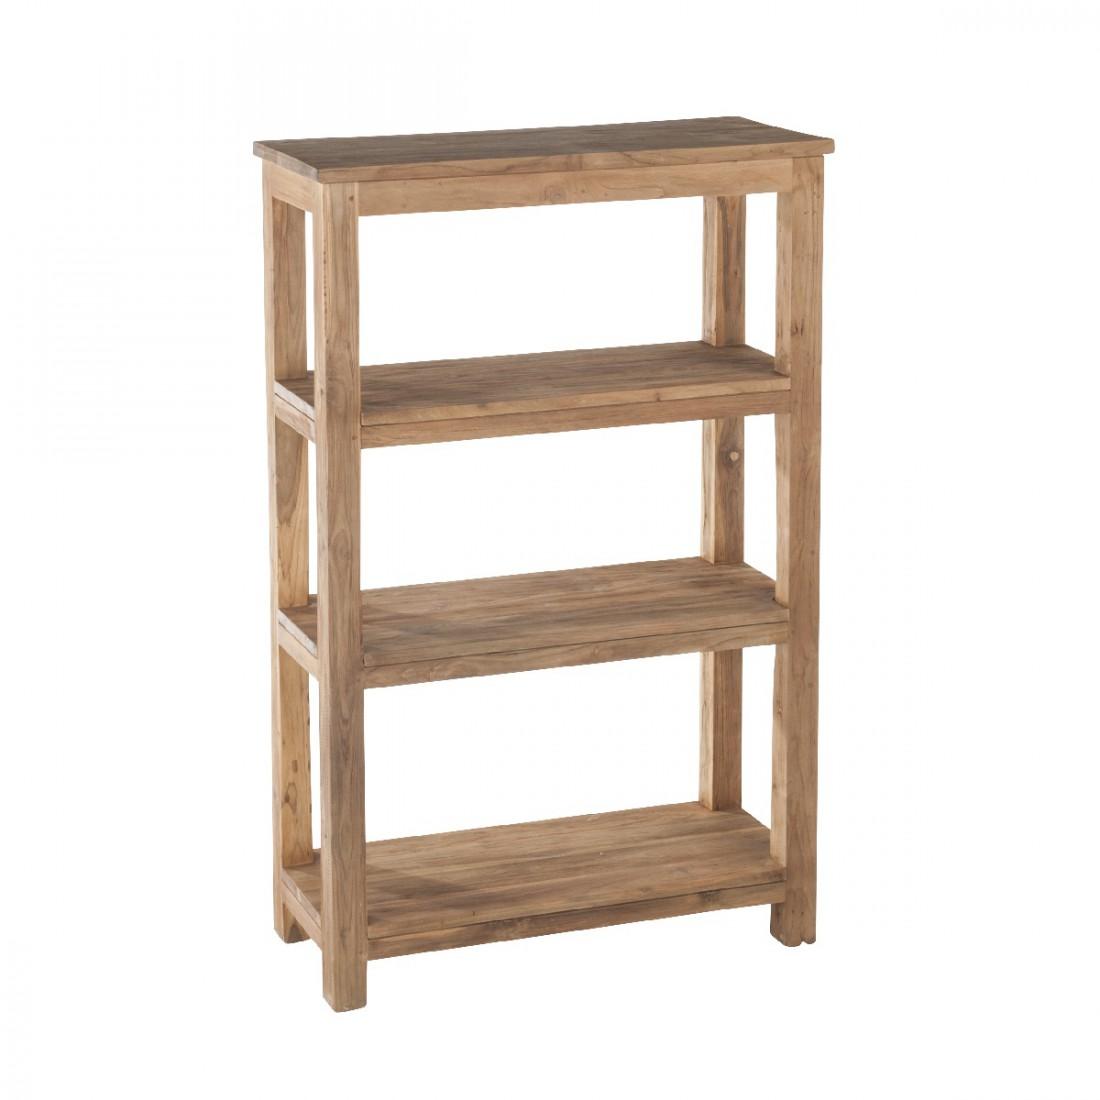 etag re 4 niveaux en teck bross recycl drift. Black Bedroom Furniture Sets. Home Design Ideas